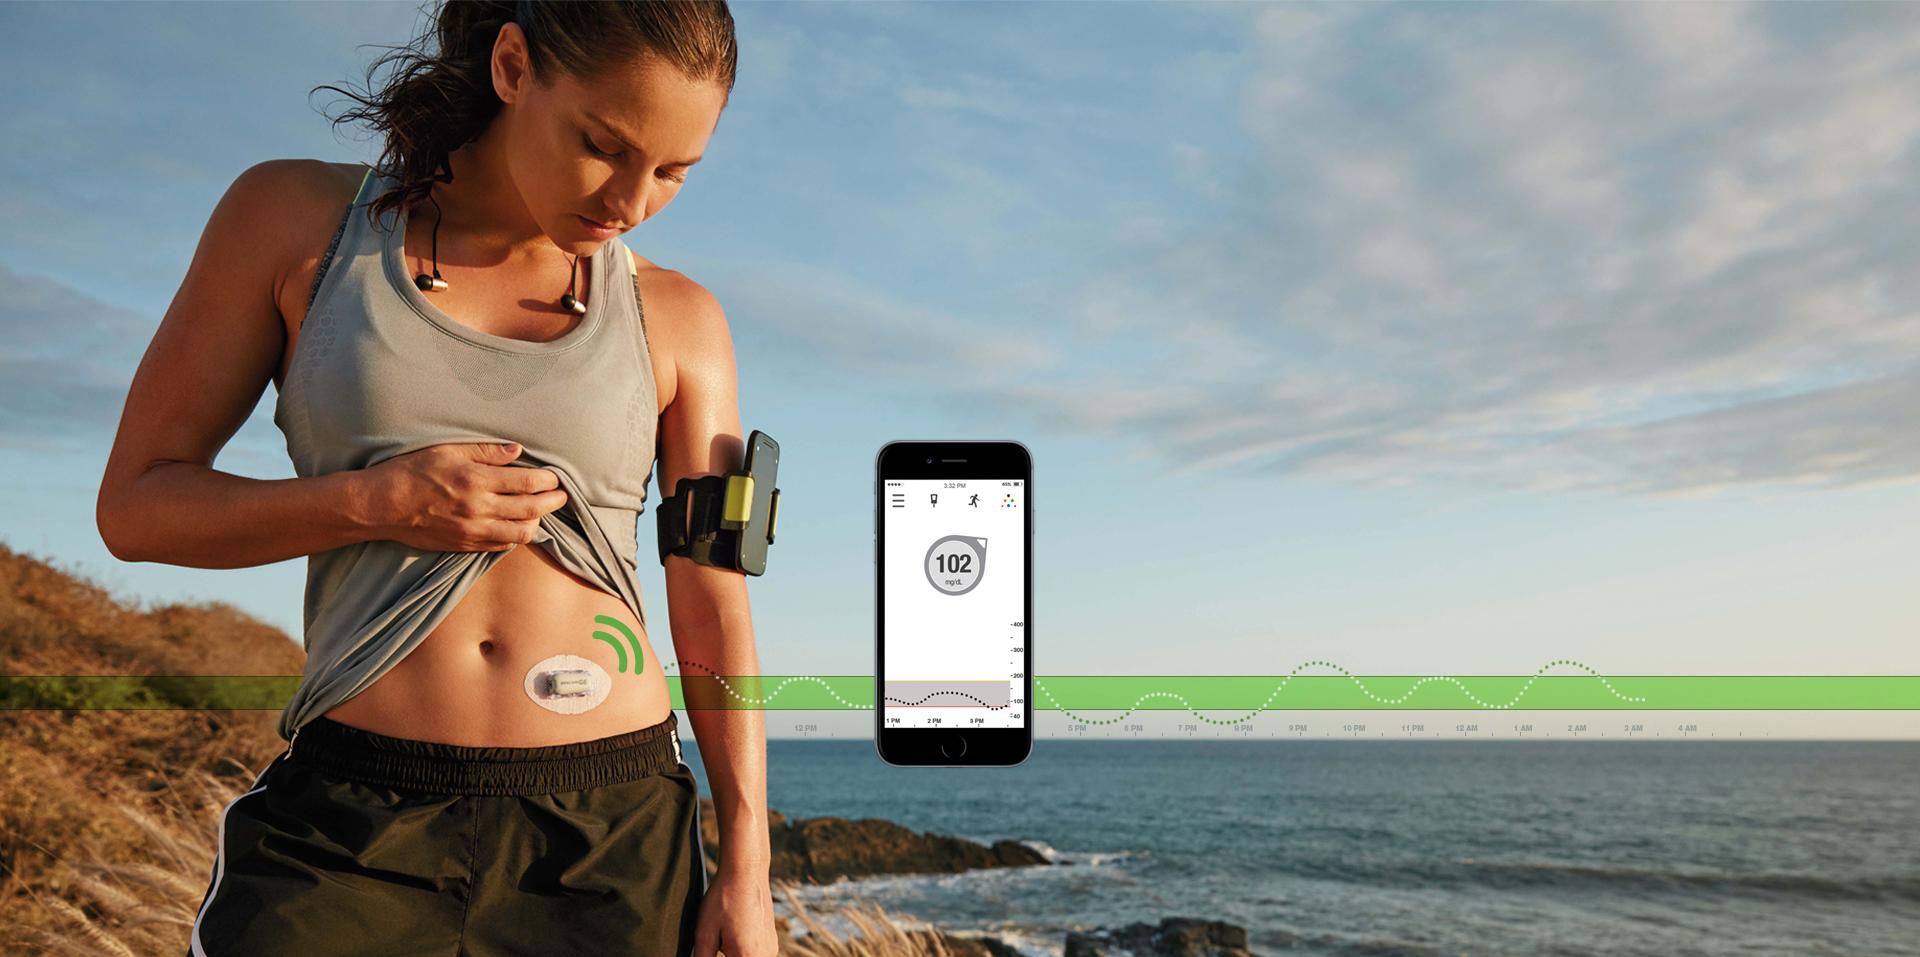 (Source: integrateddiabetes.com)